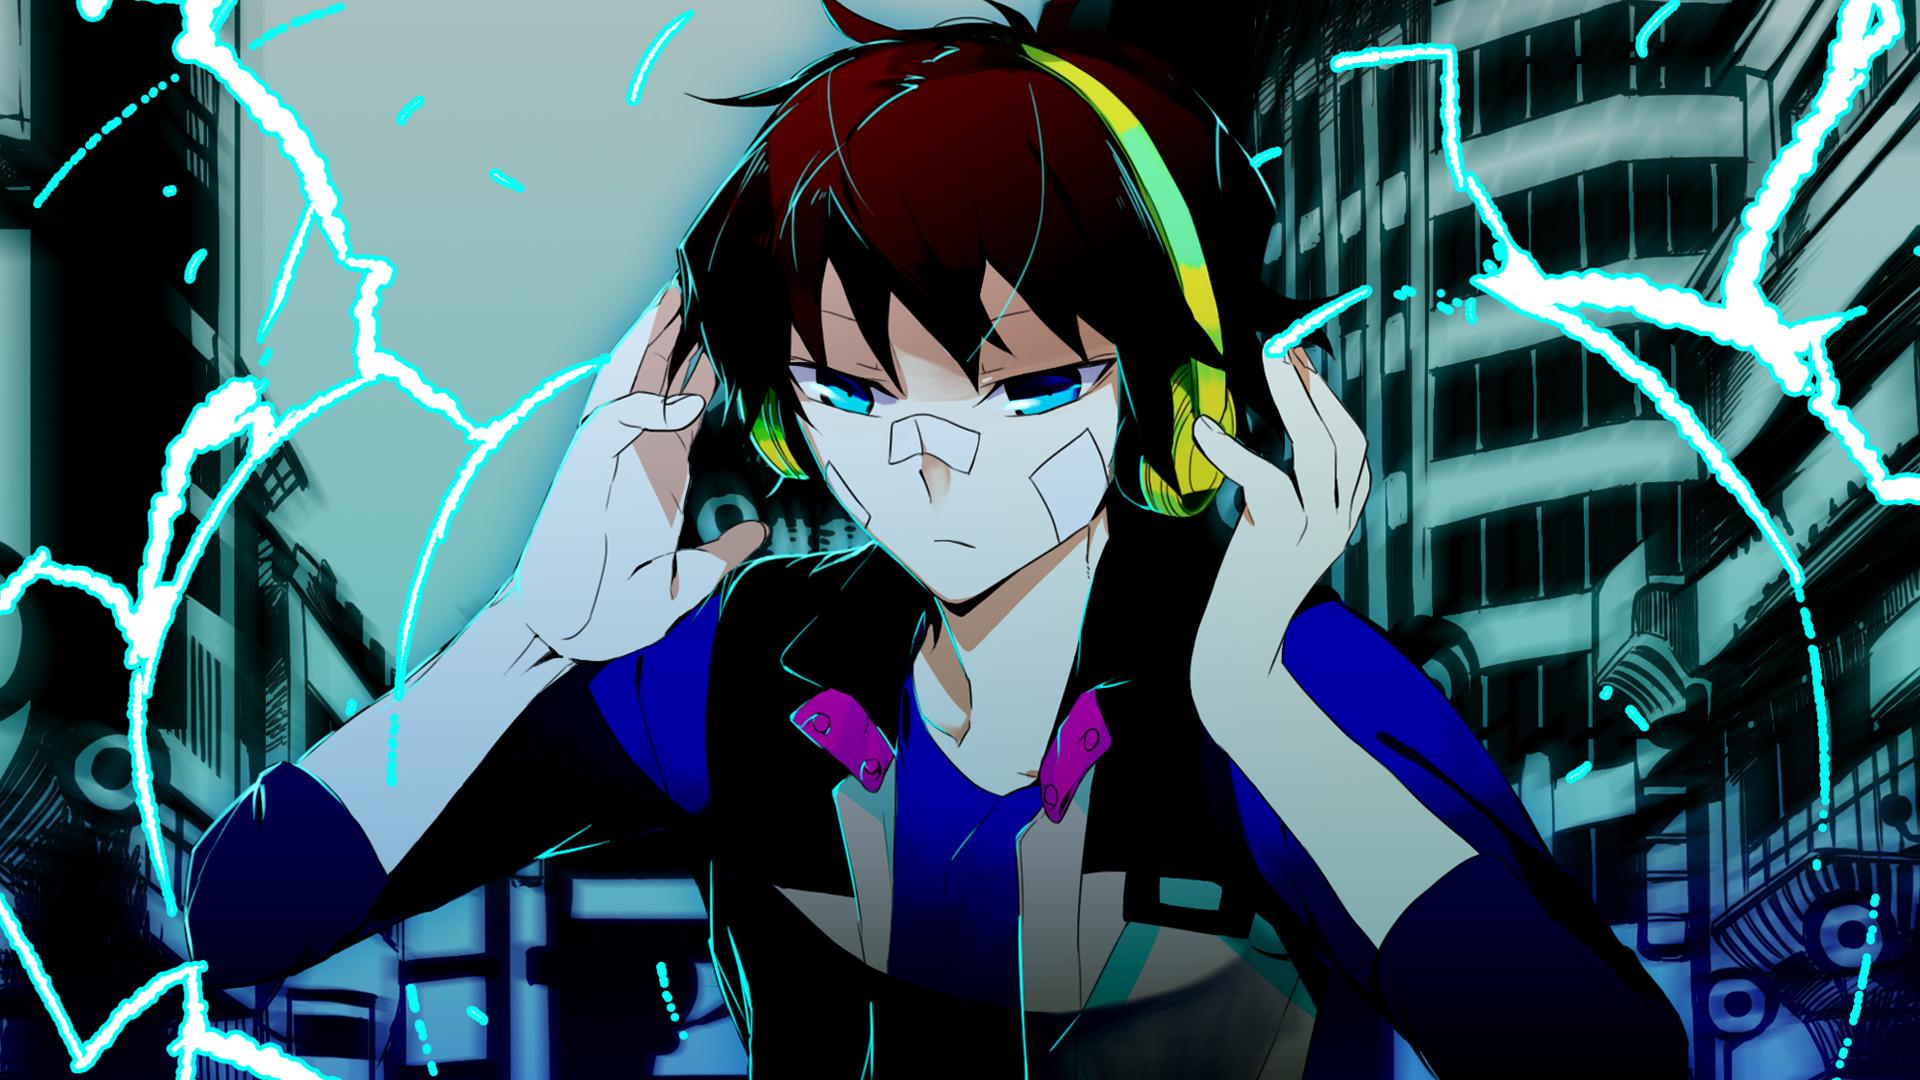 Hamatora Nice Wallpaper Nice Headphone Anime W...